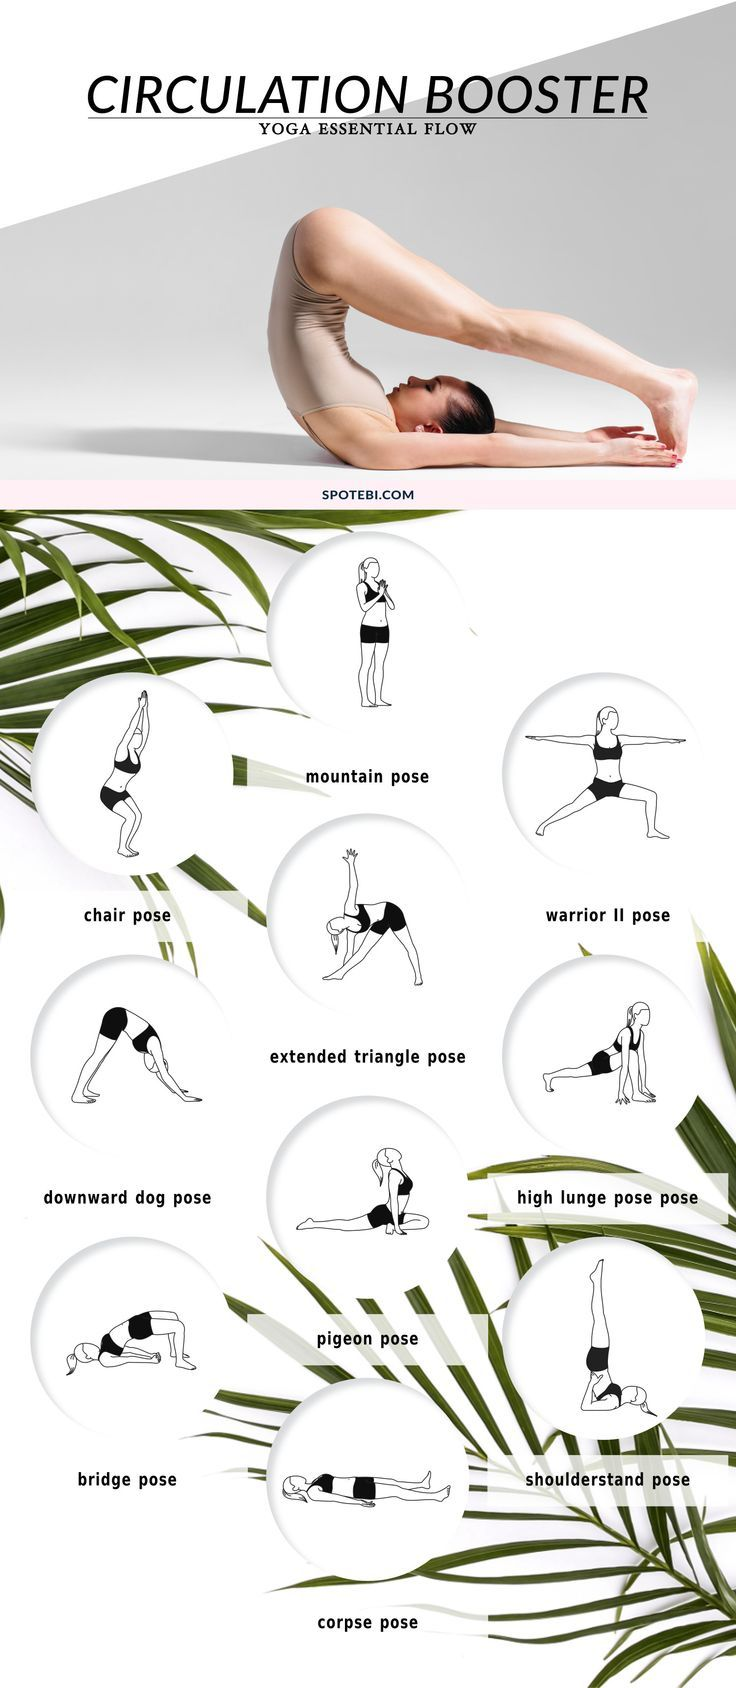 Circulation Booster  Yoga sequences, Yoga poses, Yoga